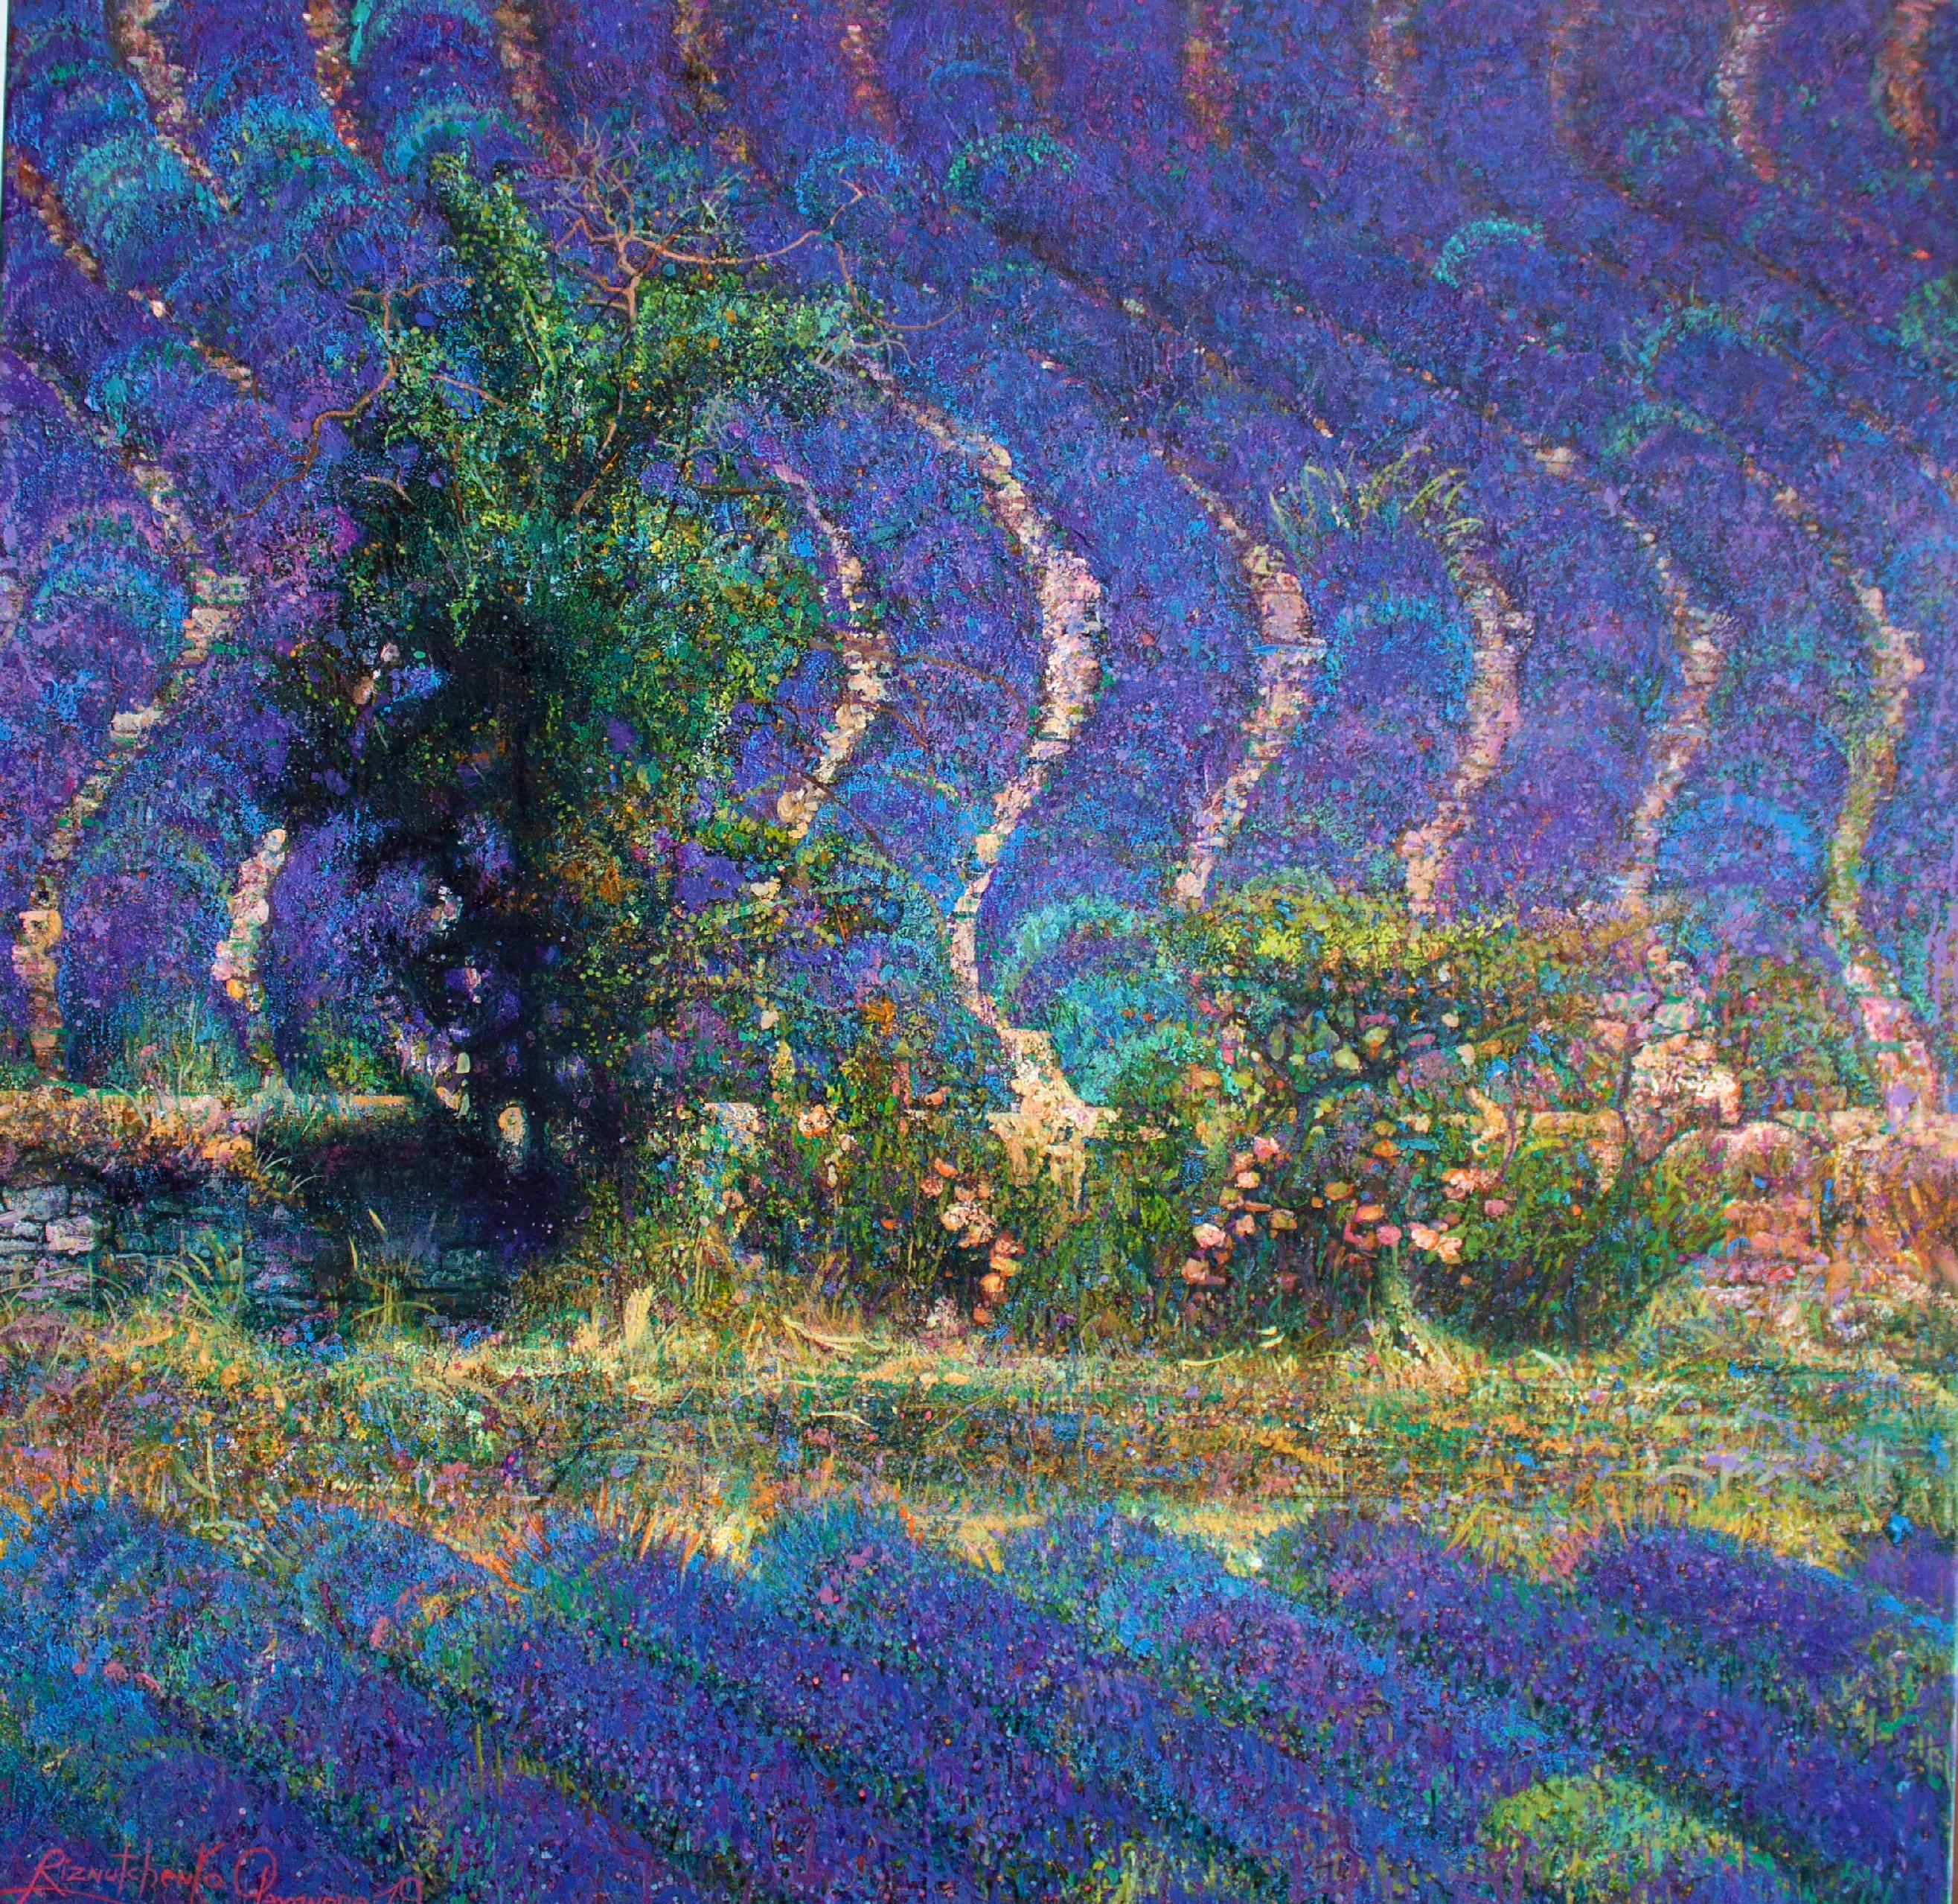 Rhythm of Lavender - Oil Landscape Painting Colors Purple Green Brown Blue White